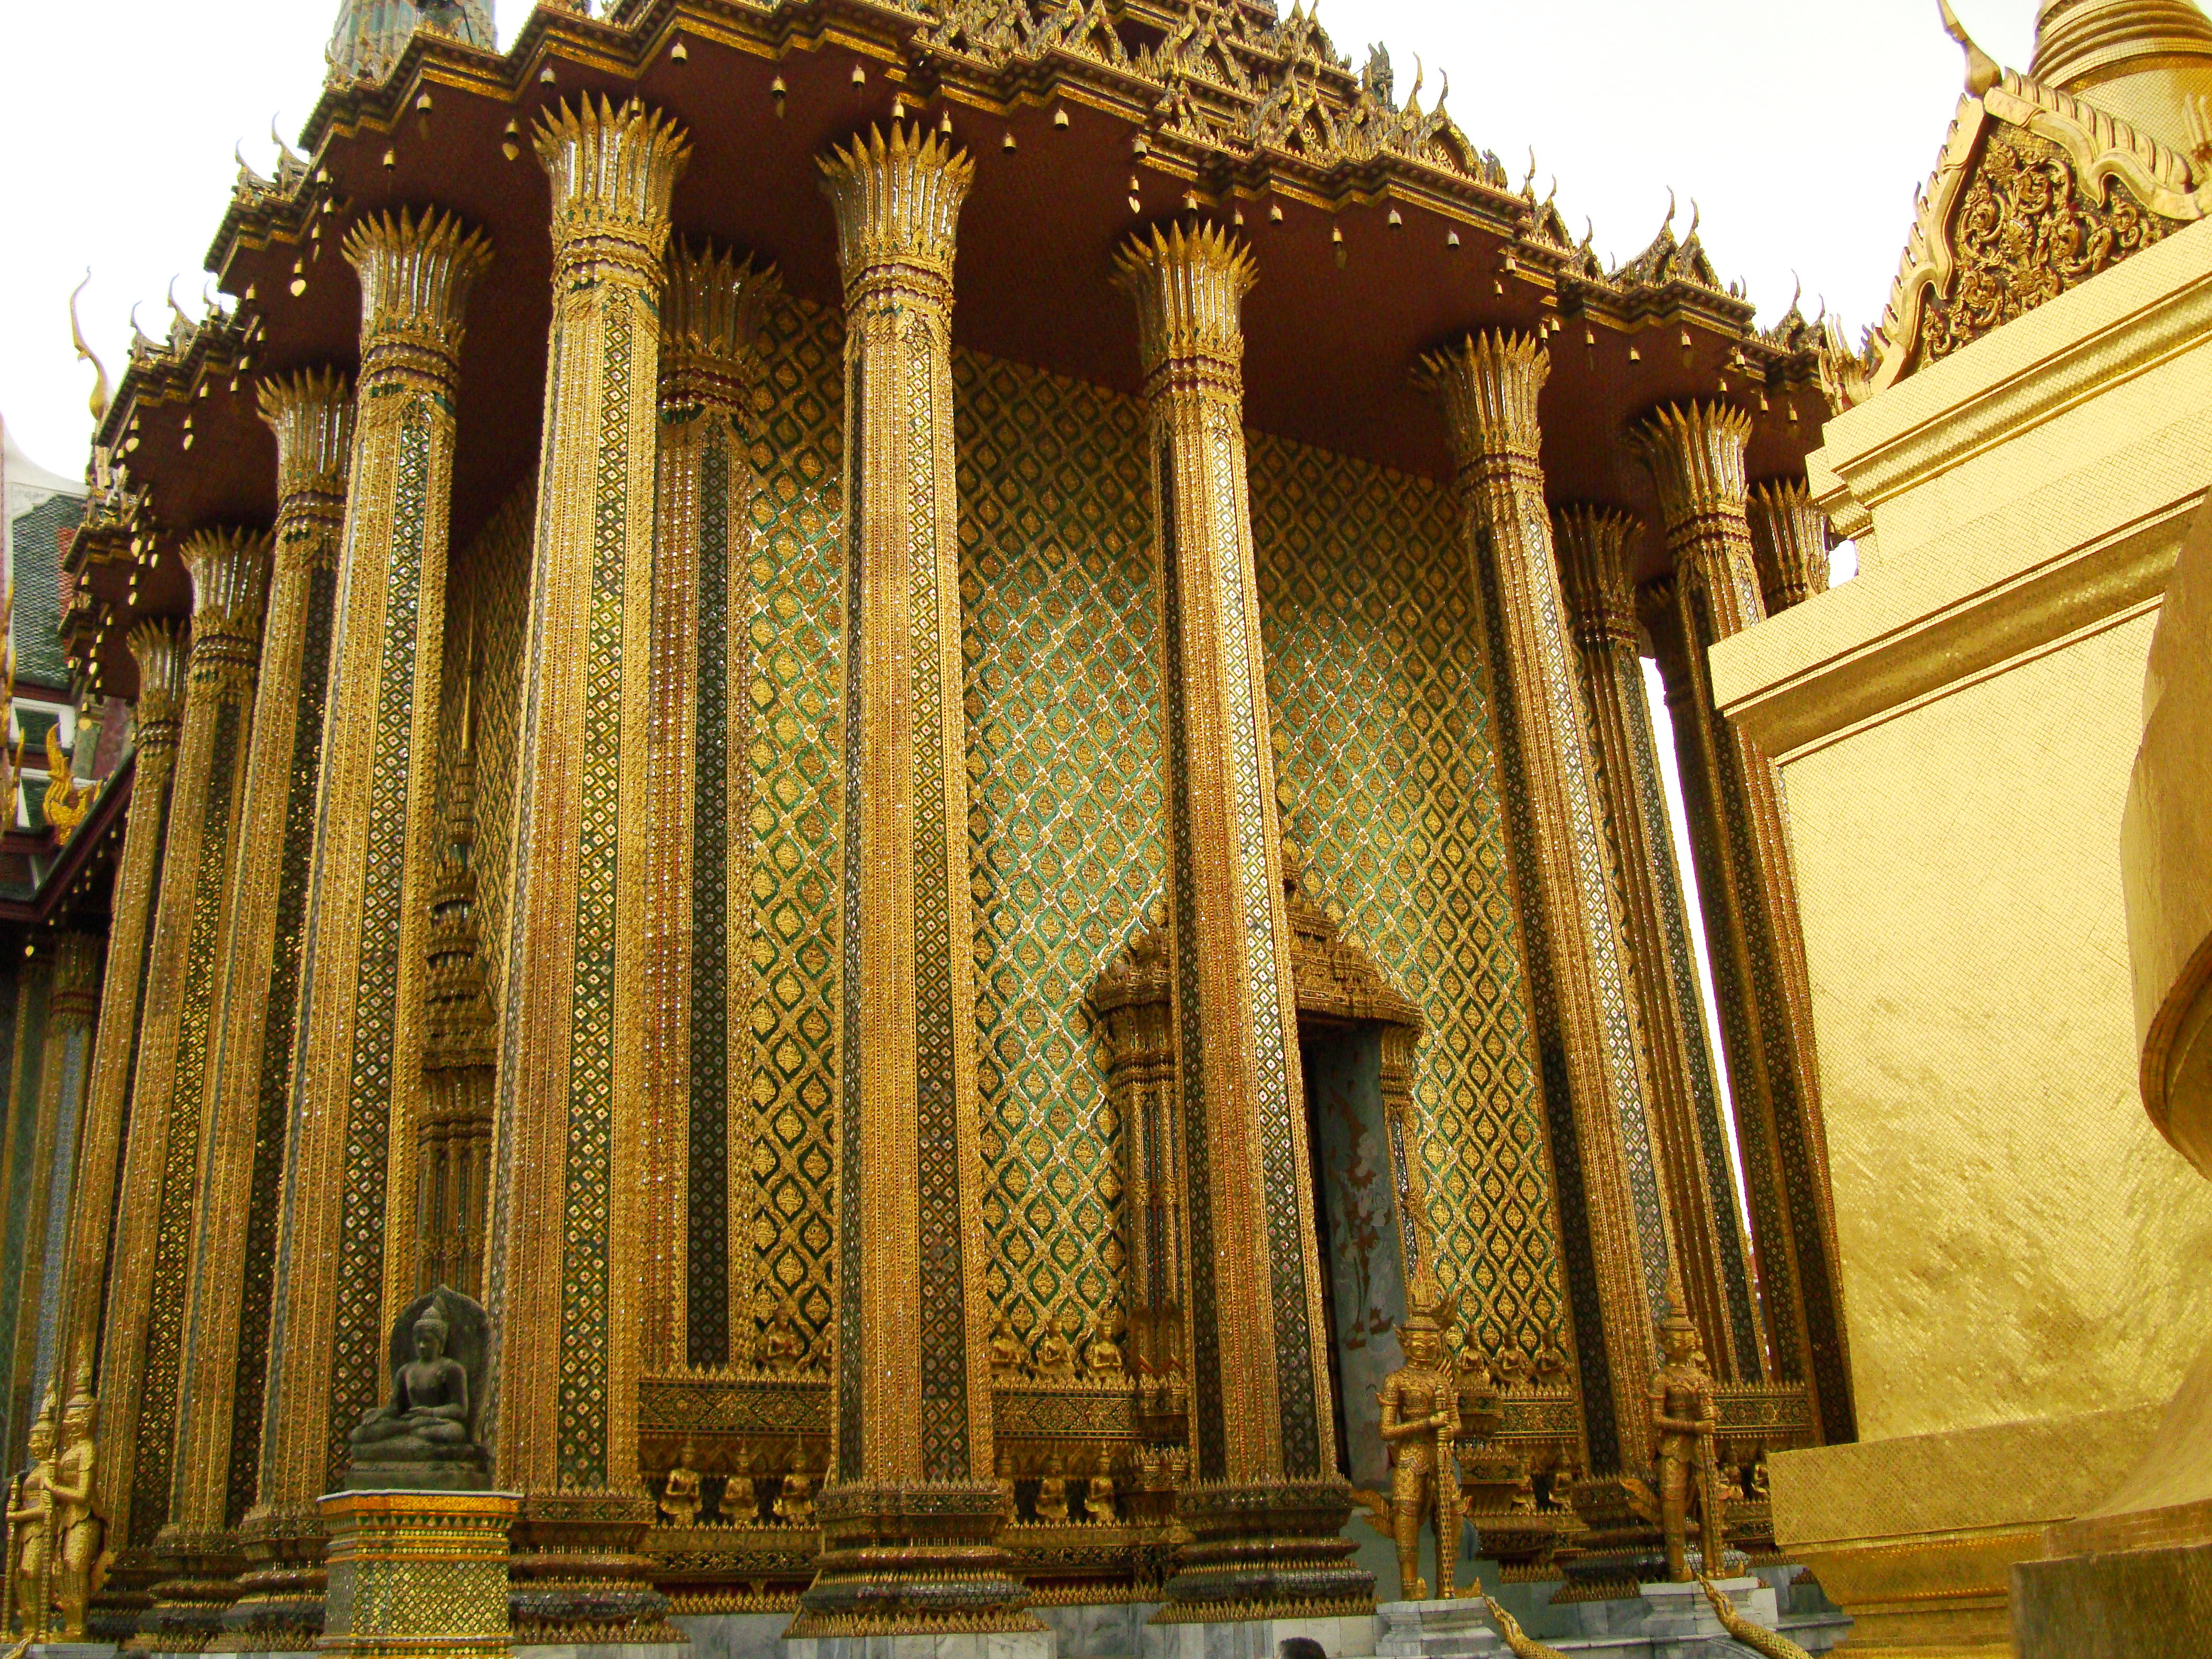 07 Phra Mondop Grand Palace Bangkok 2010 07